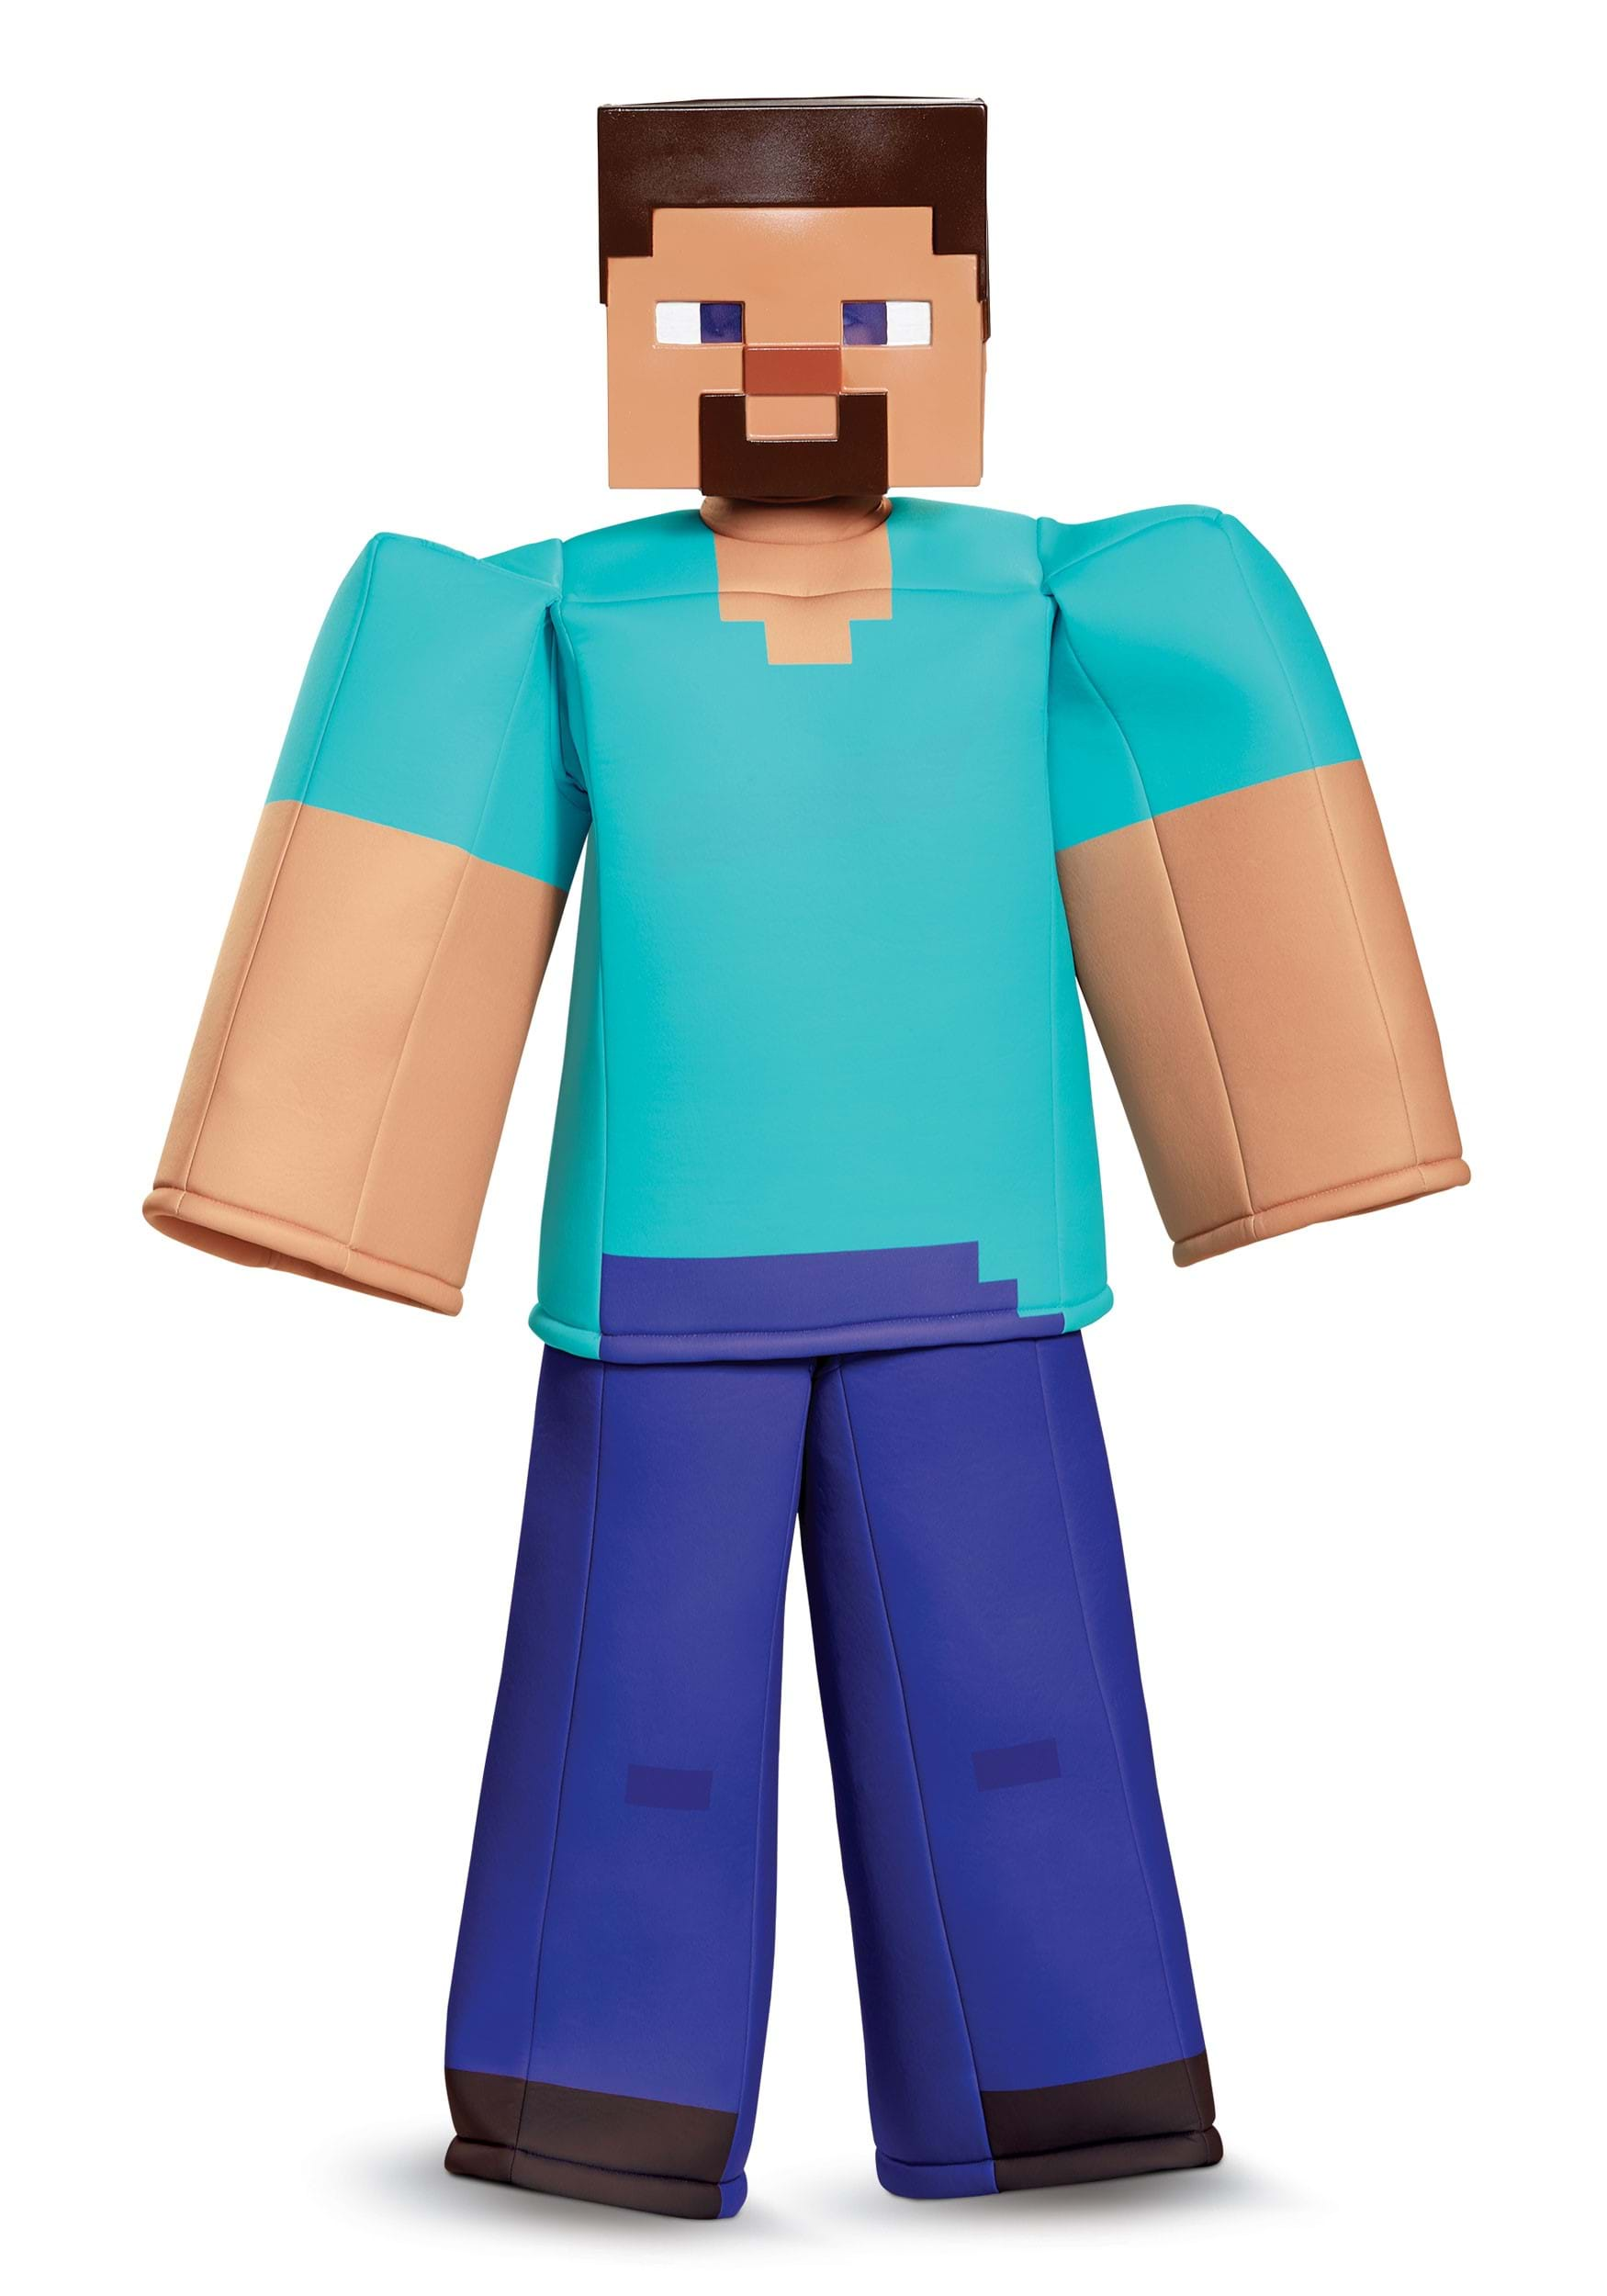 Steve Prestige Costume for Boys from Minecraft